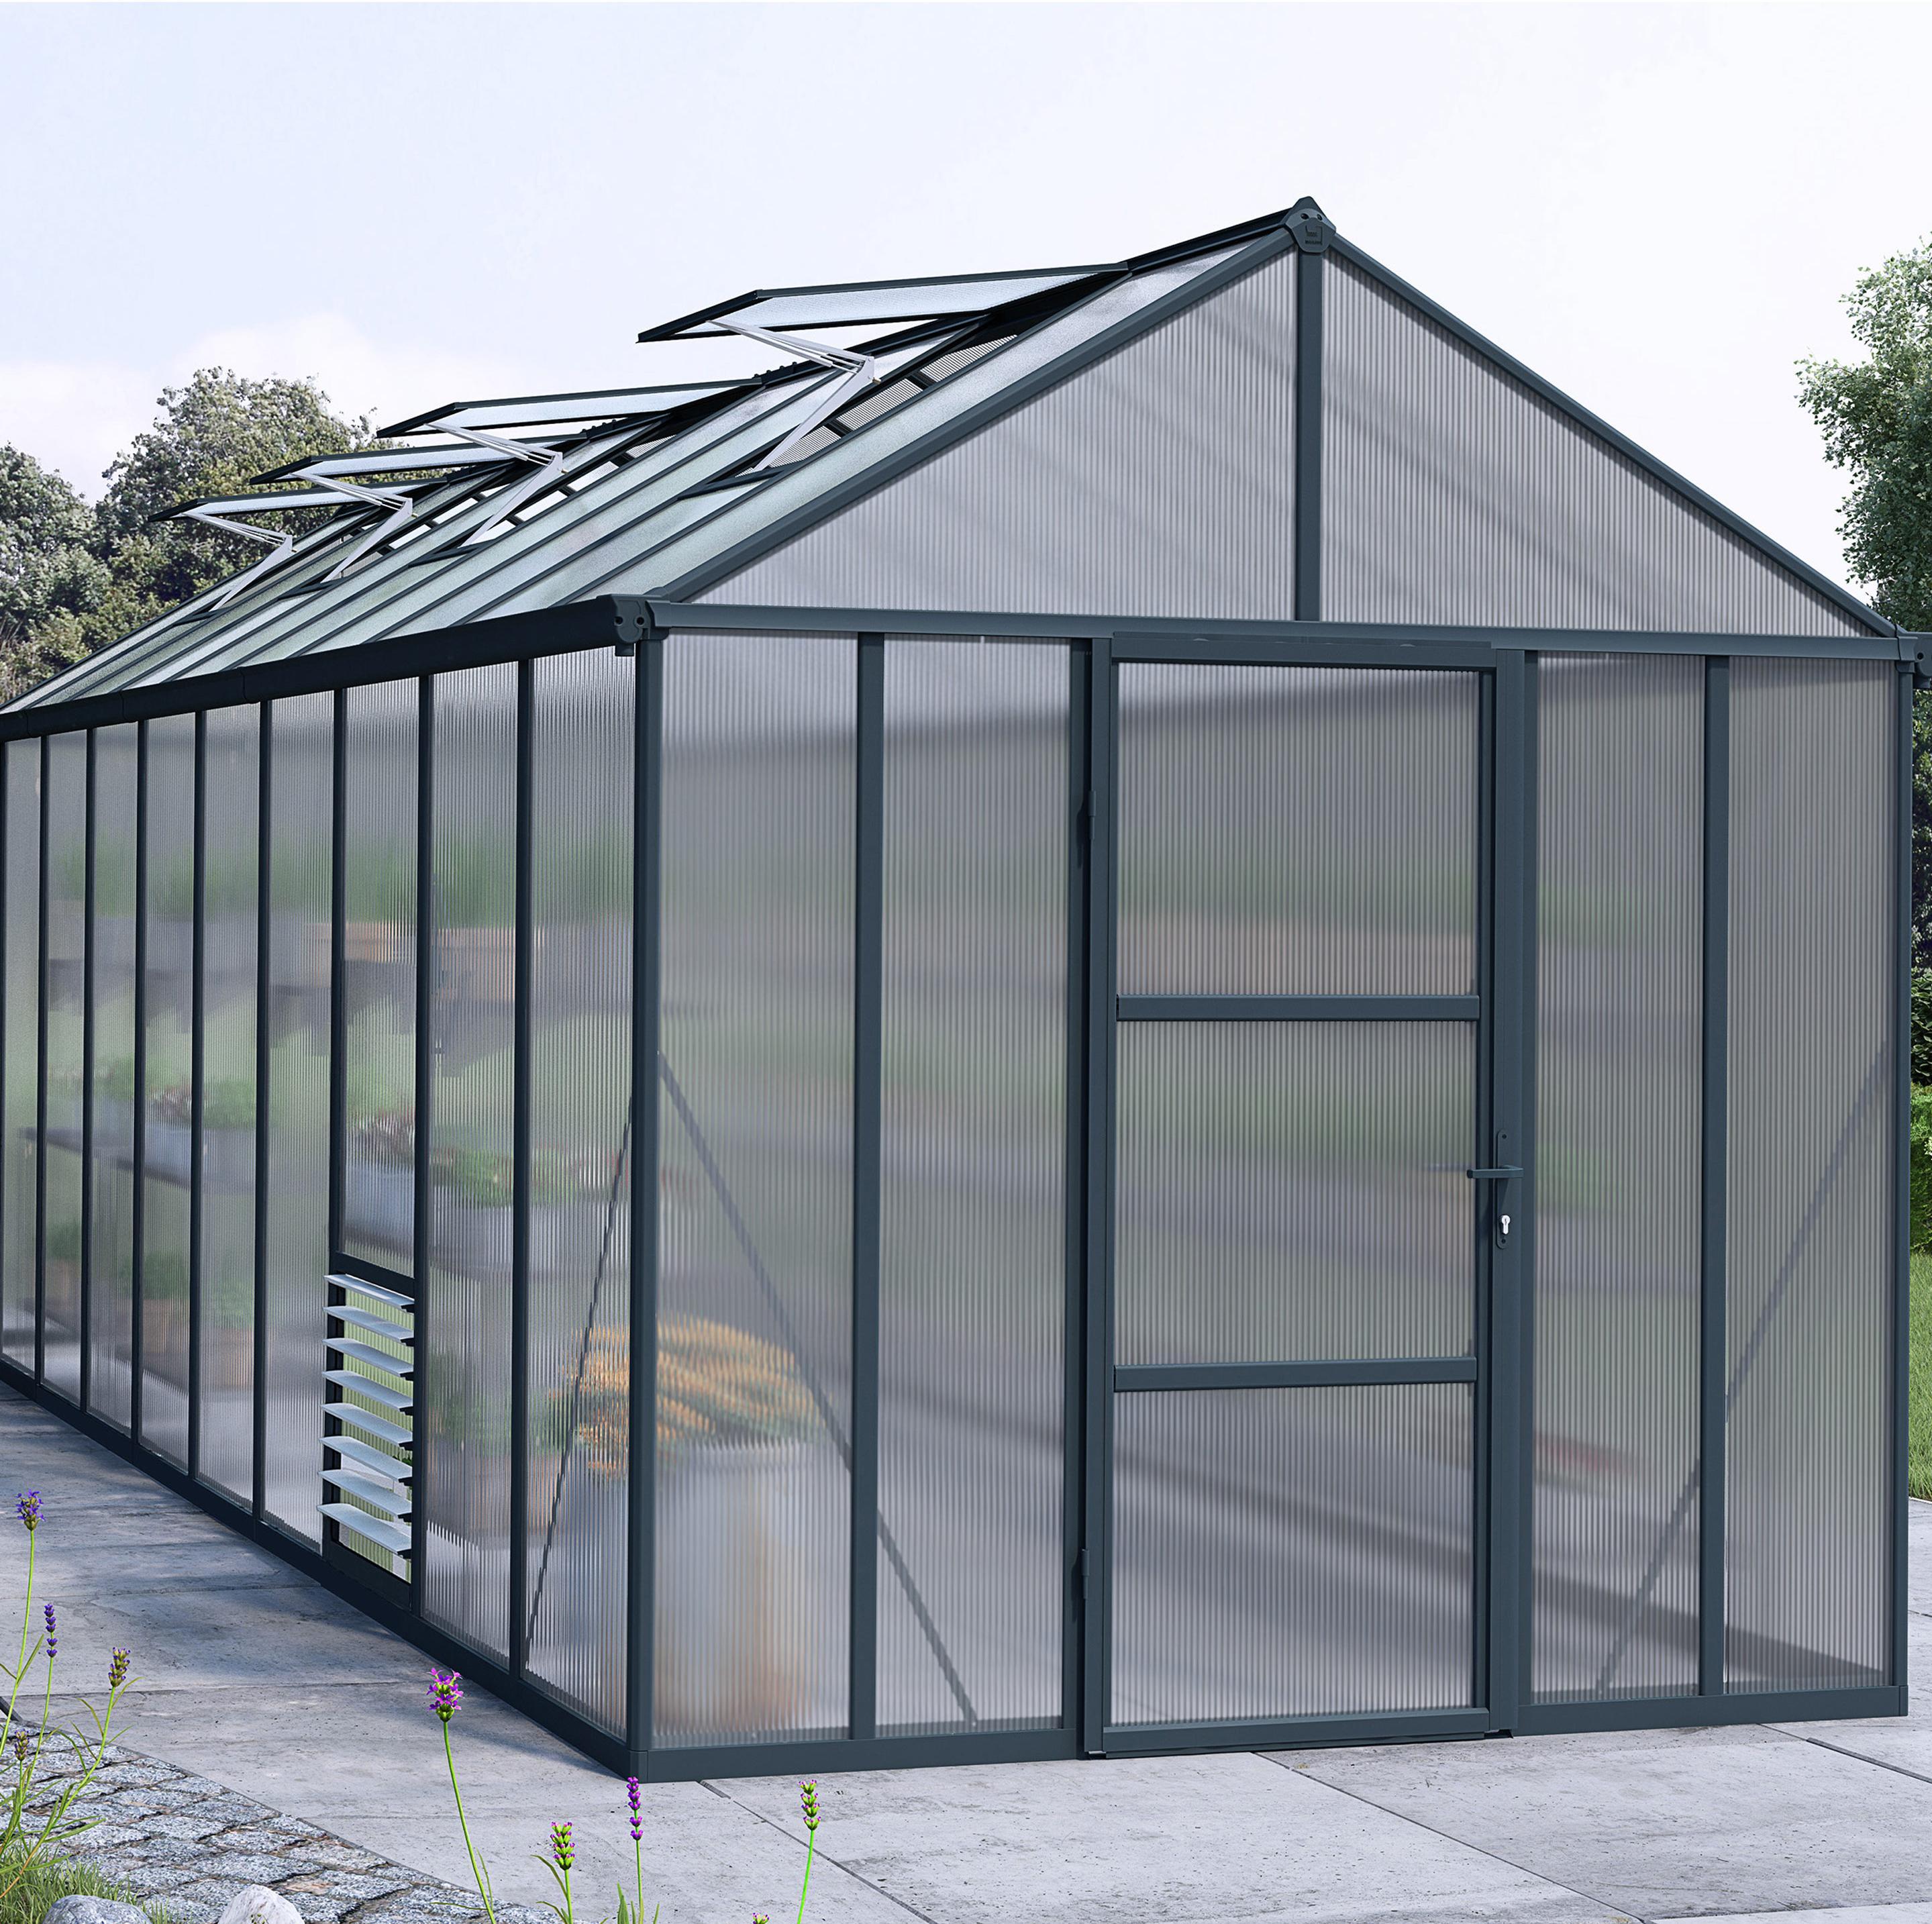 Serre De Jardin Glory 14 3 M Aluminium Et Polycarbonate Double Parois Palram Serre Jardin Polycarbonate Paroi